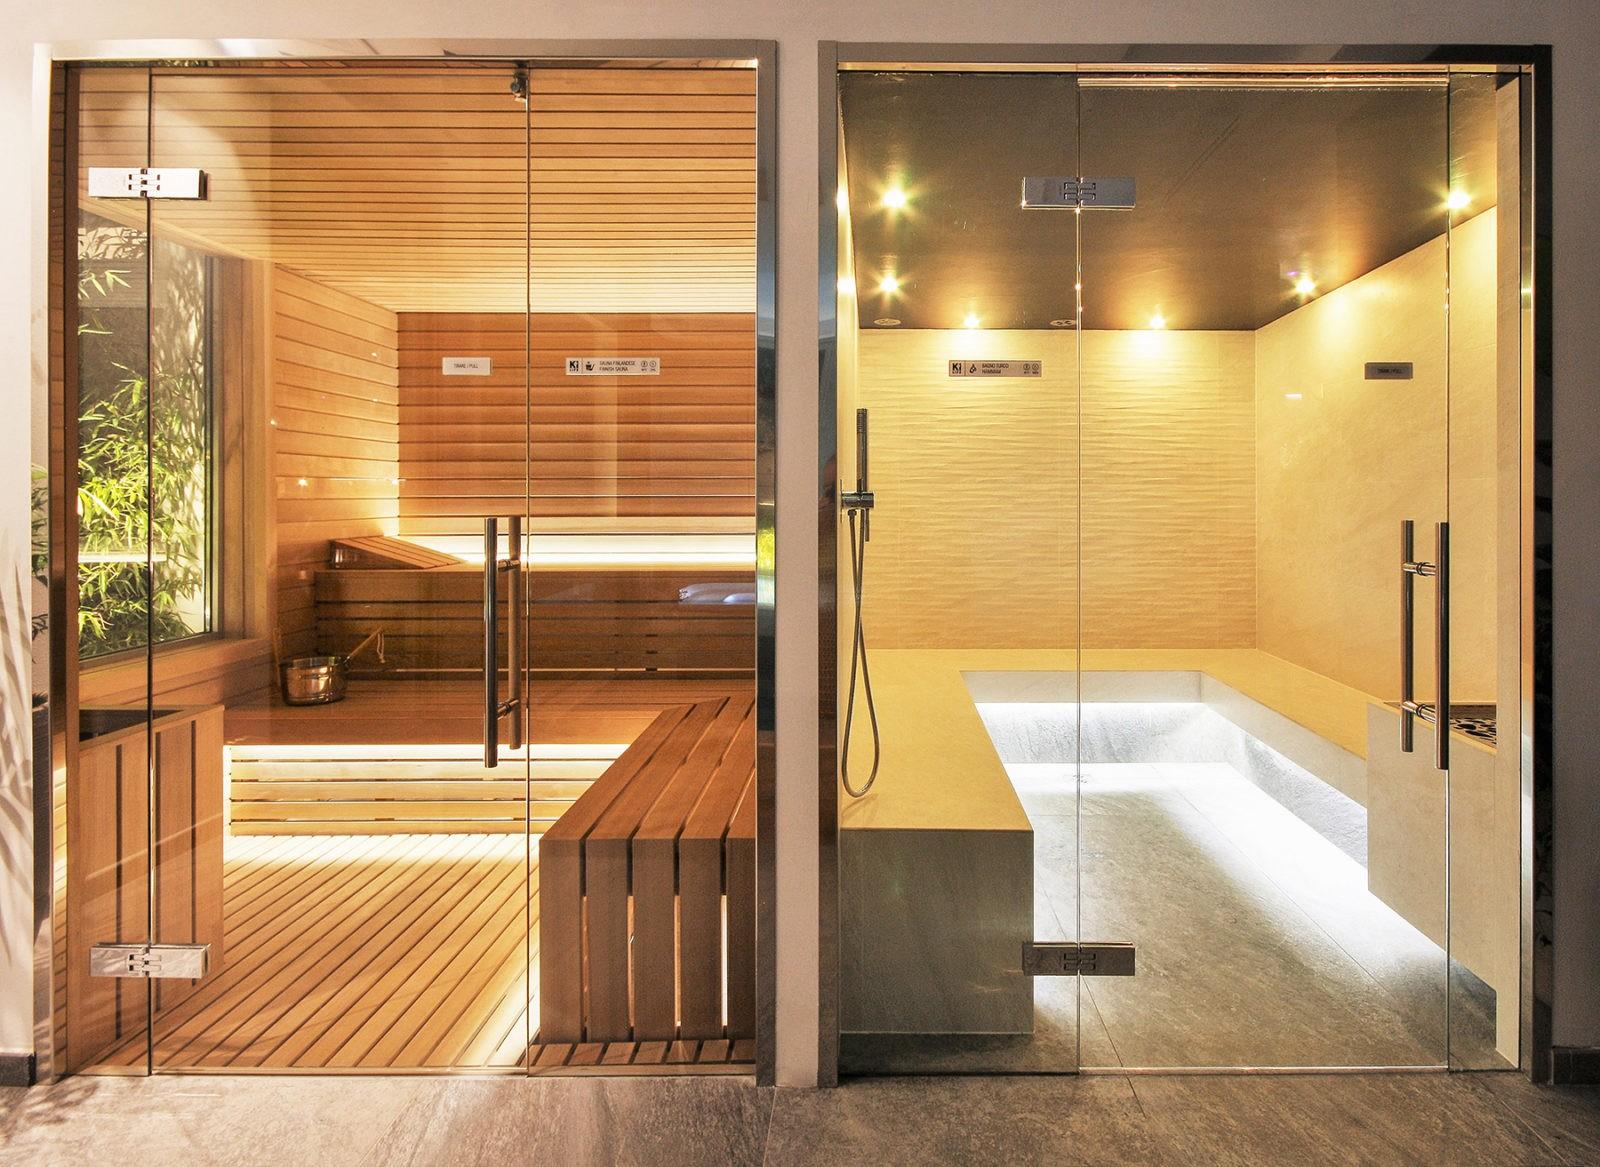 Hotel Morigi Bagno turco sauna finlandese